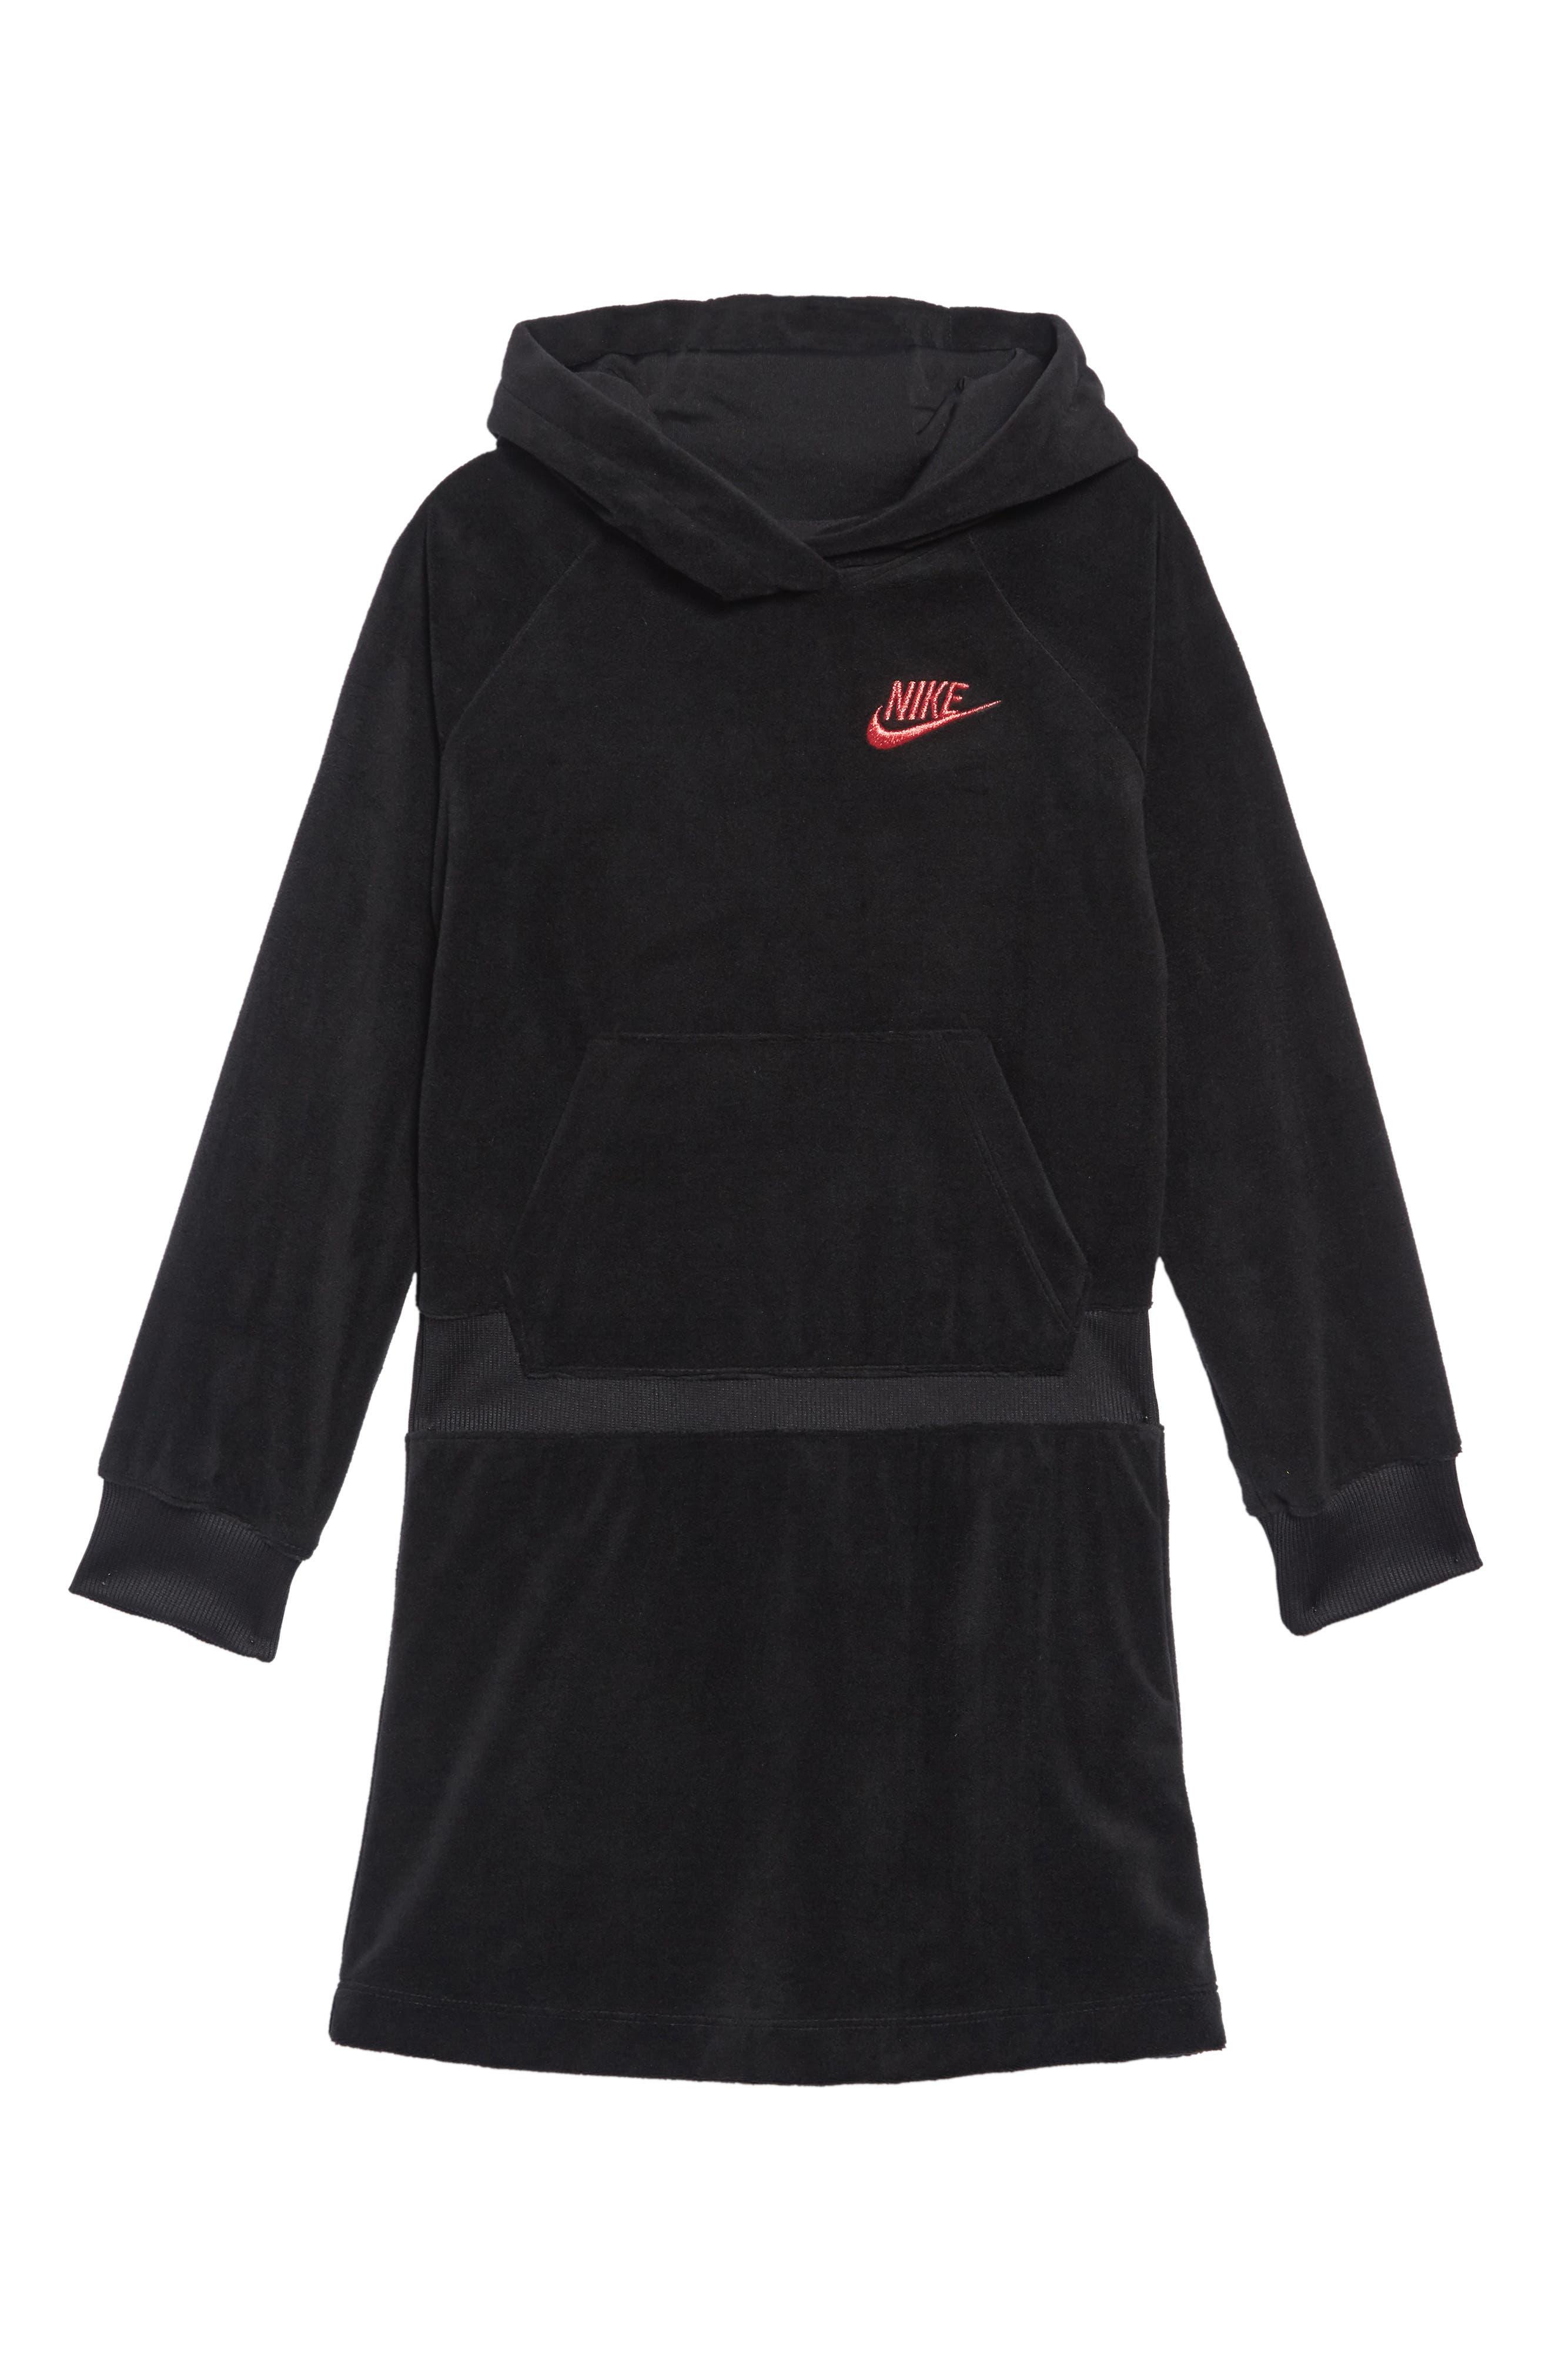 Velour Hooded Sweatshirt Dress,                         Main,                         color, BLACK